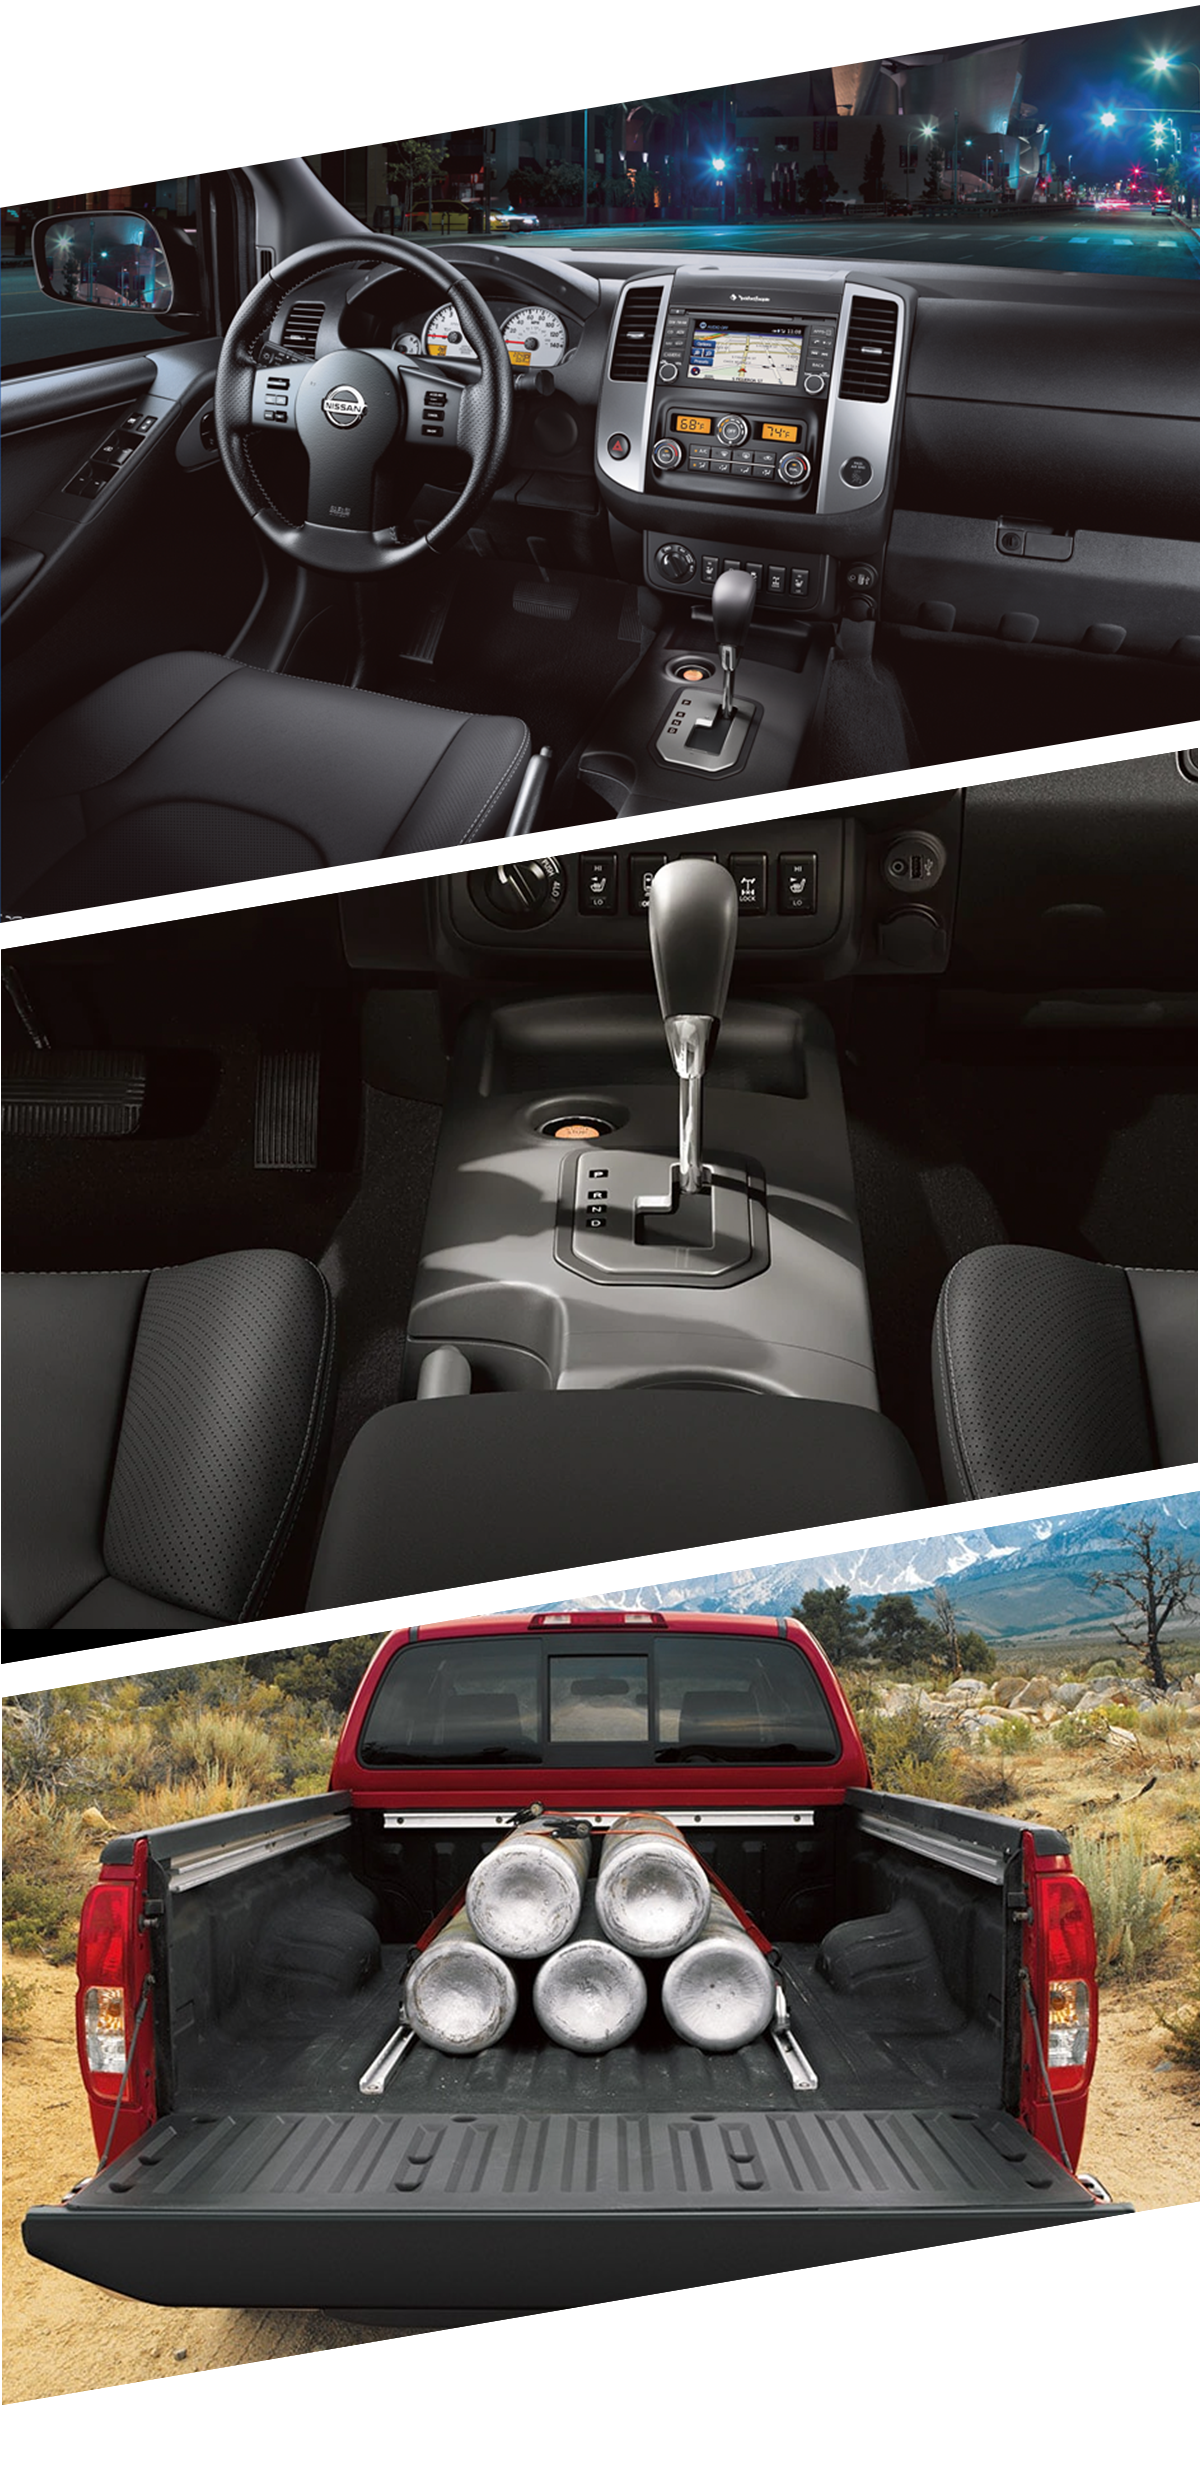 2021 Nissan Frontier Interior Images in Fort Walton Beach, FL